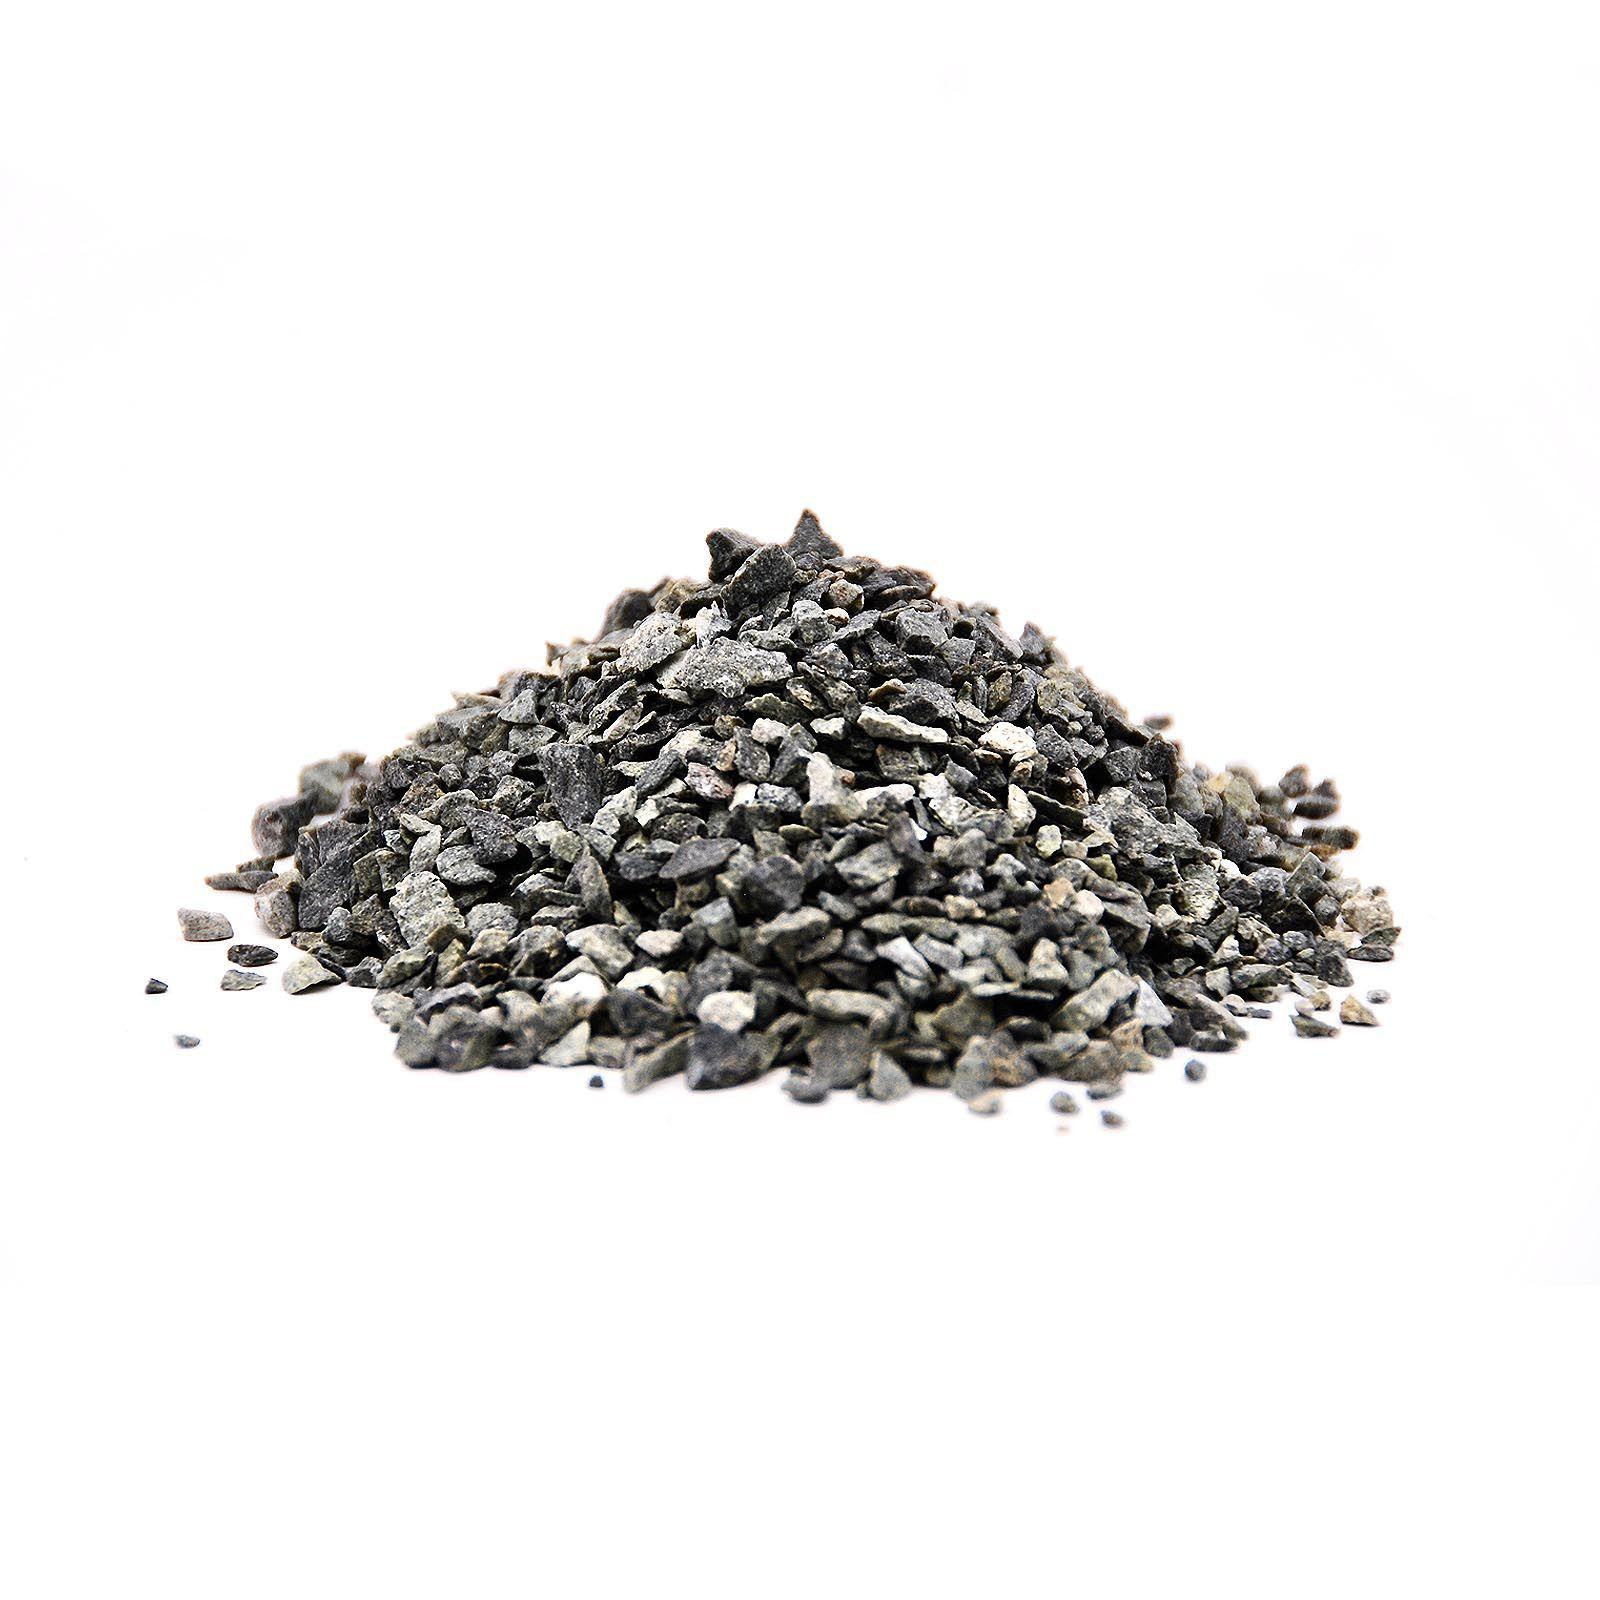 Crushed Granite Aggregate for Concrete Countertops 5 lb.